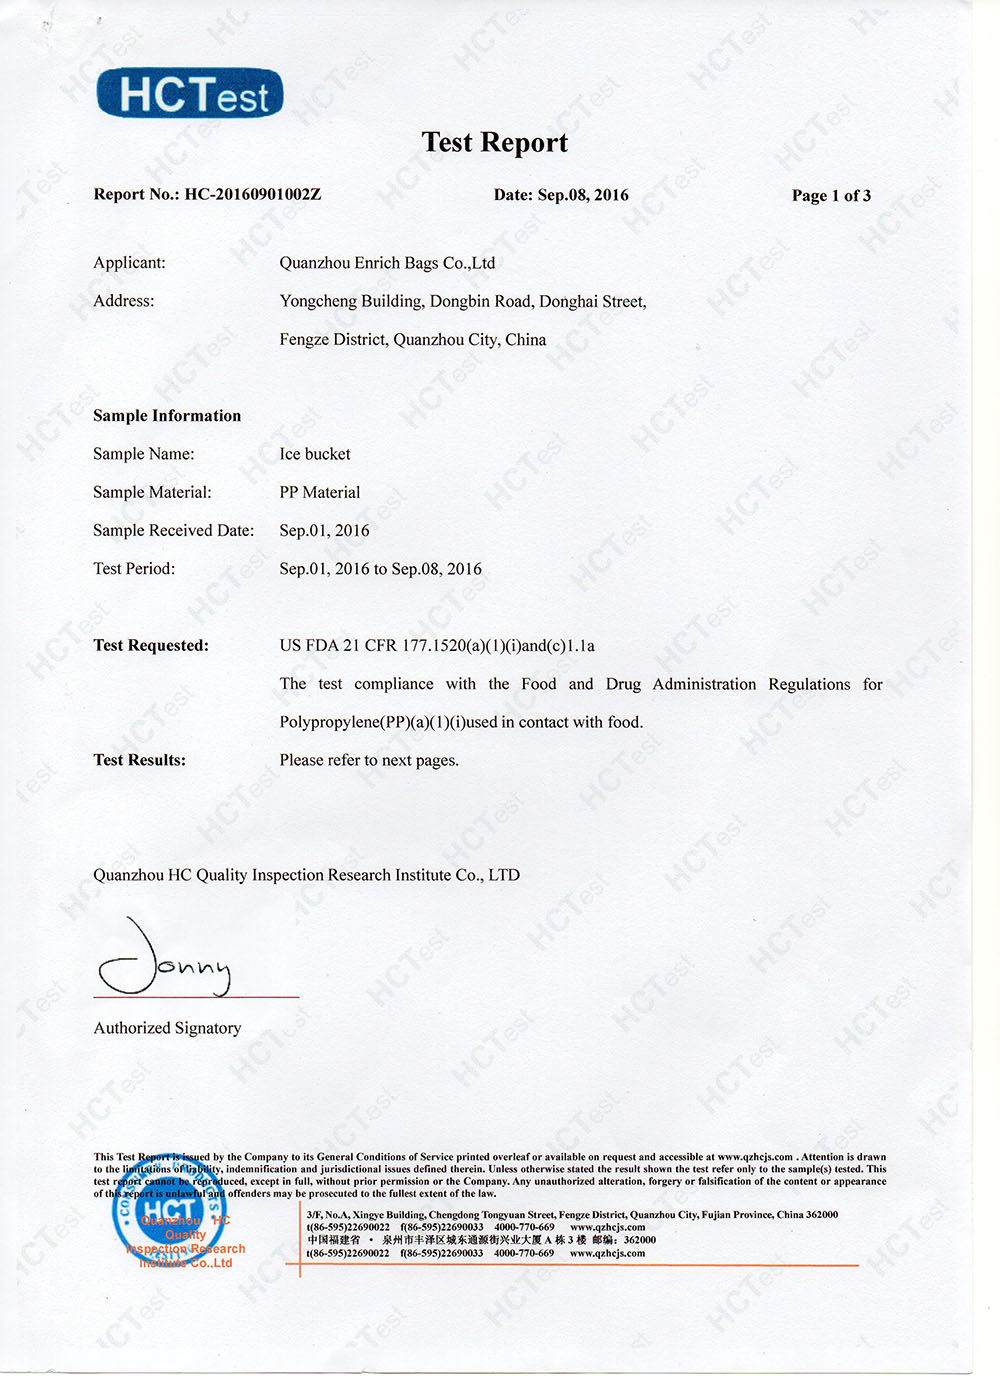 FDA Report of Cooler bags